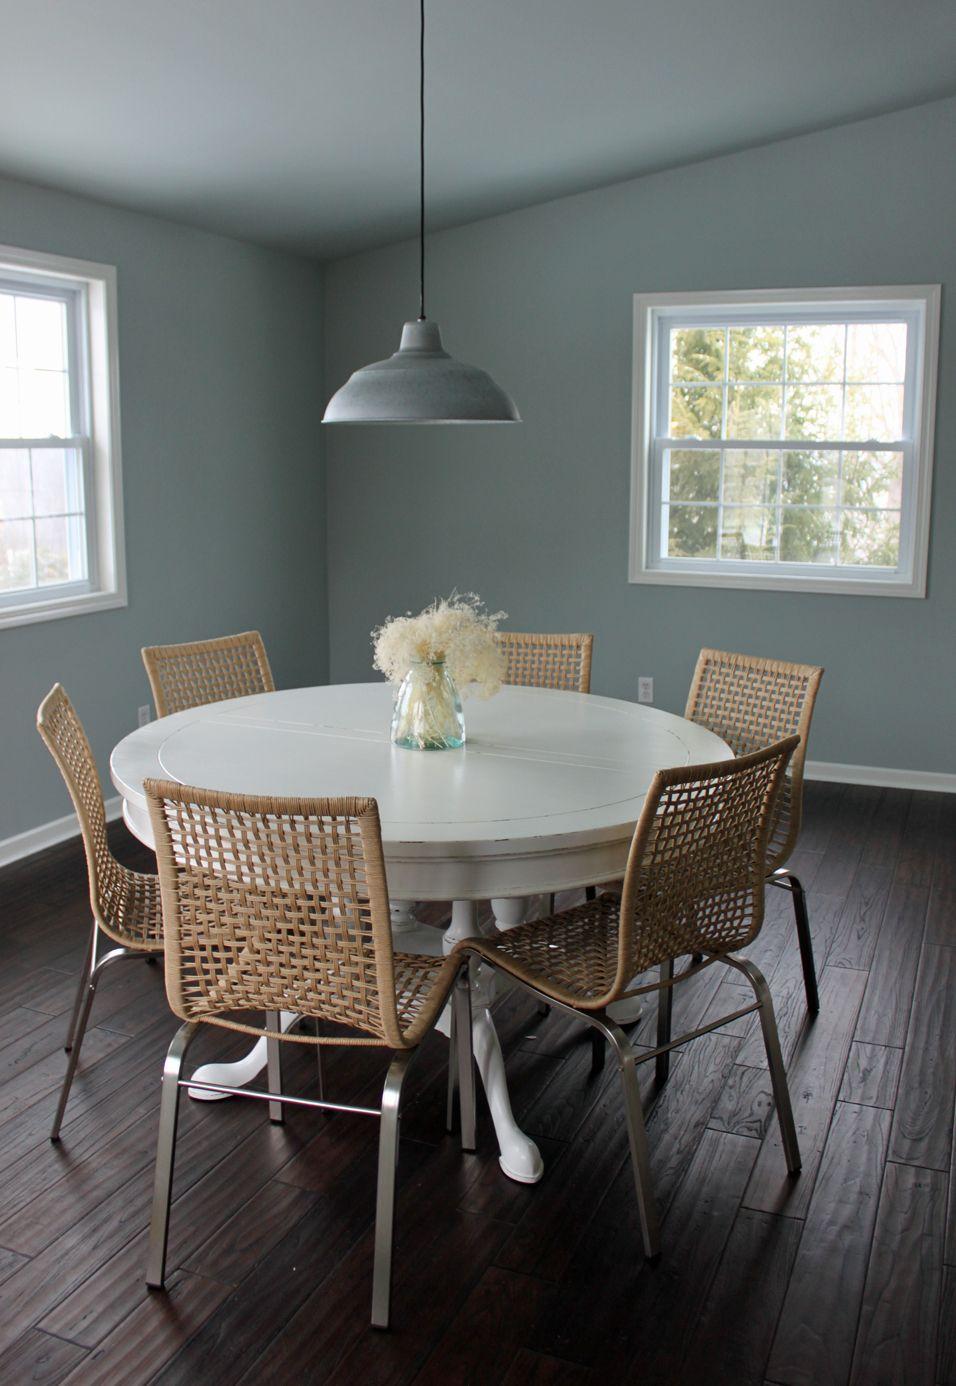 Ikea Nandor Chair With White Table On Dark Wood Floor